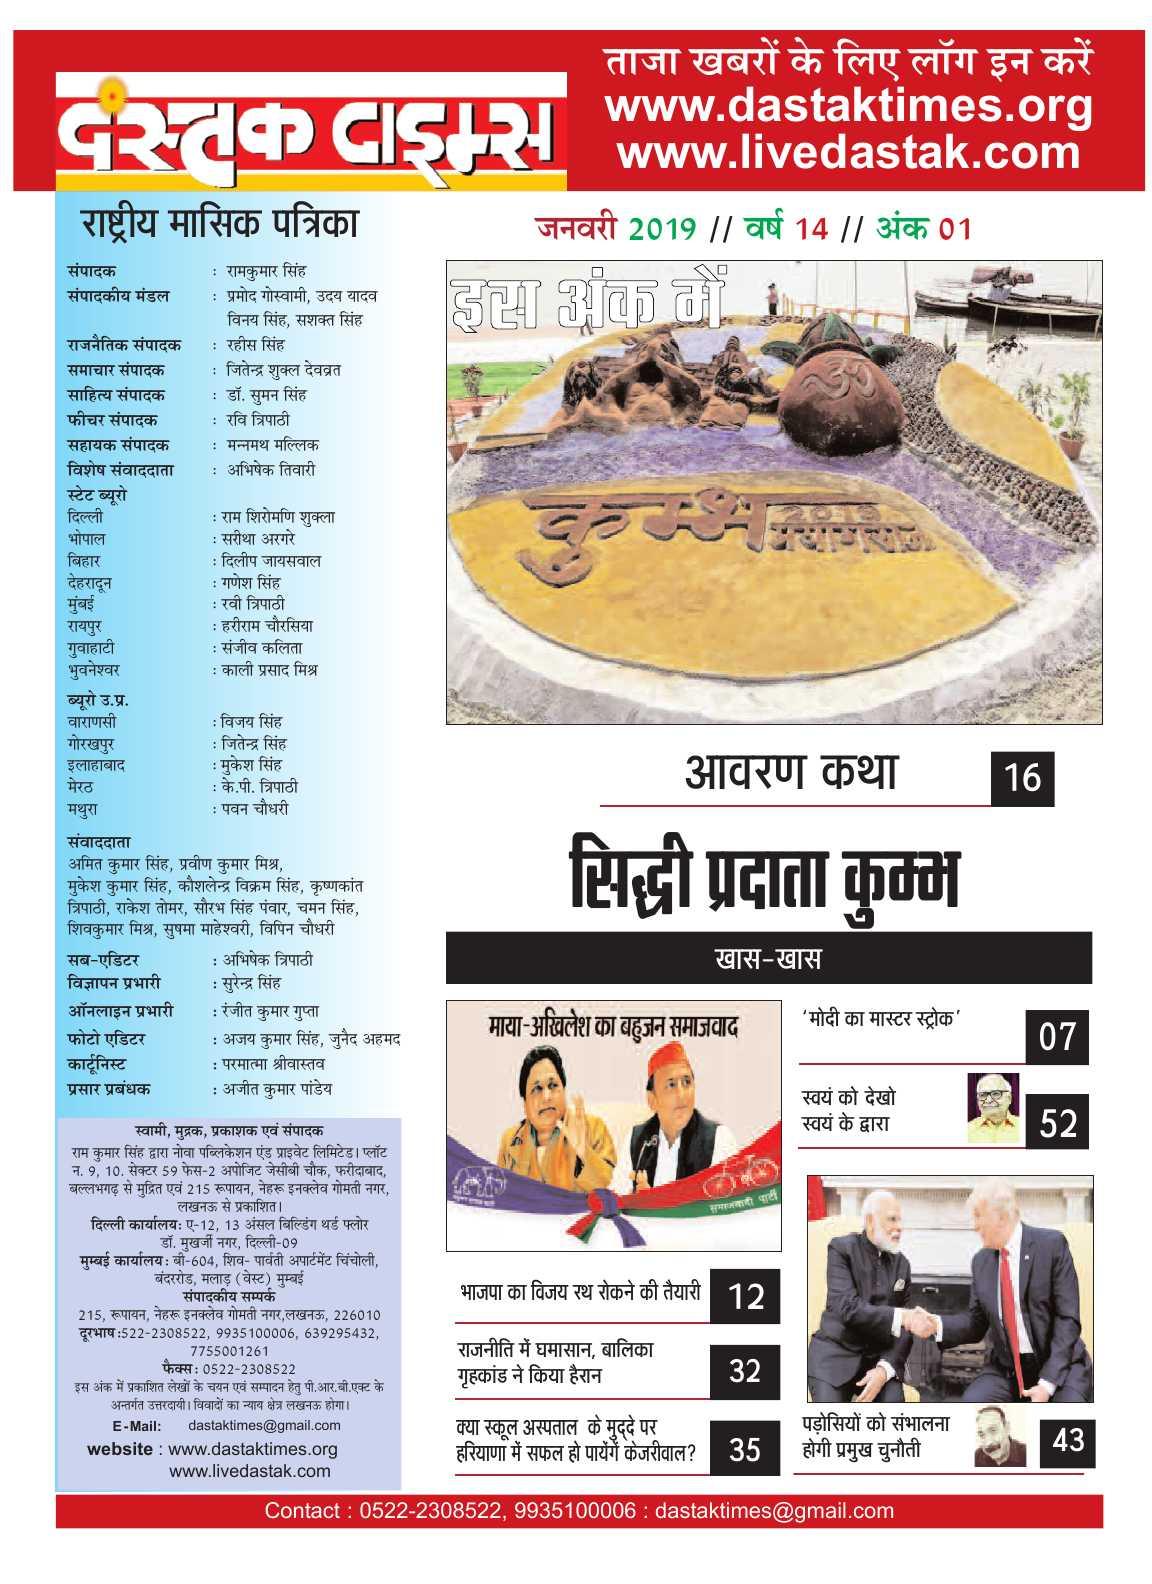 Dastak Times for E-Magazine 15 Jan 2019 new3